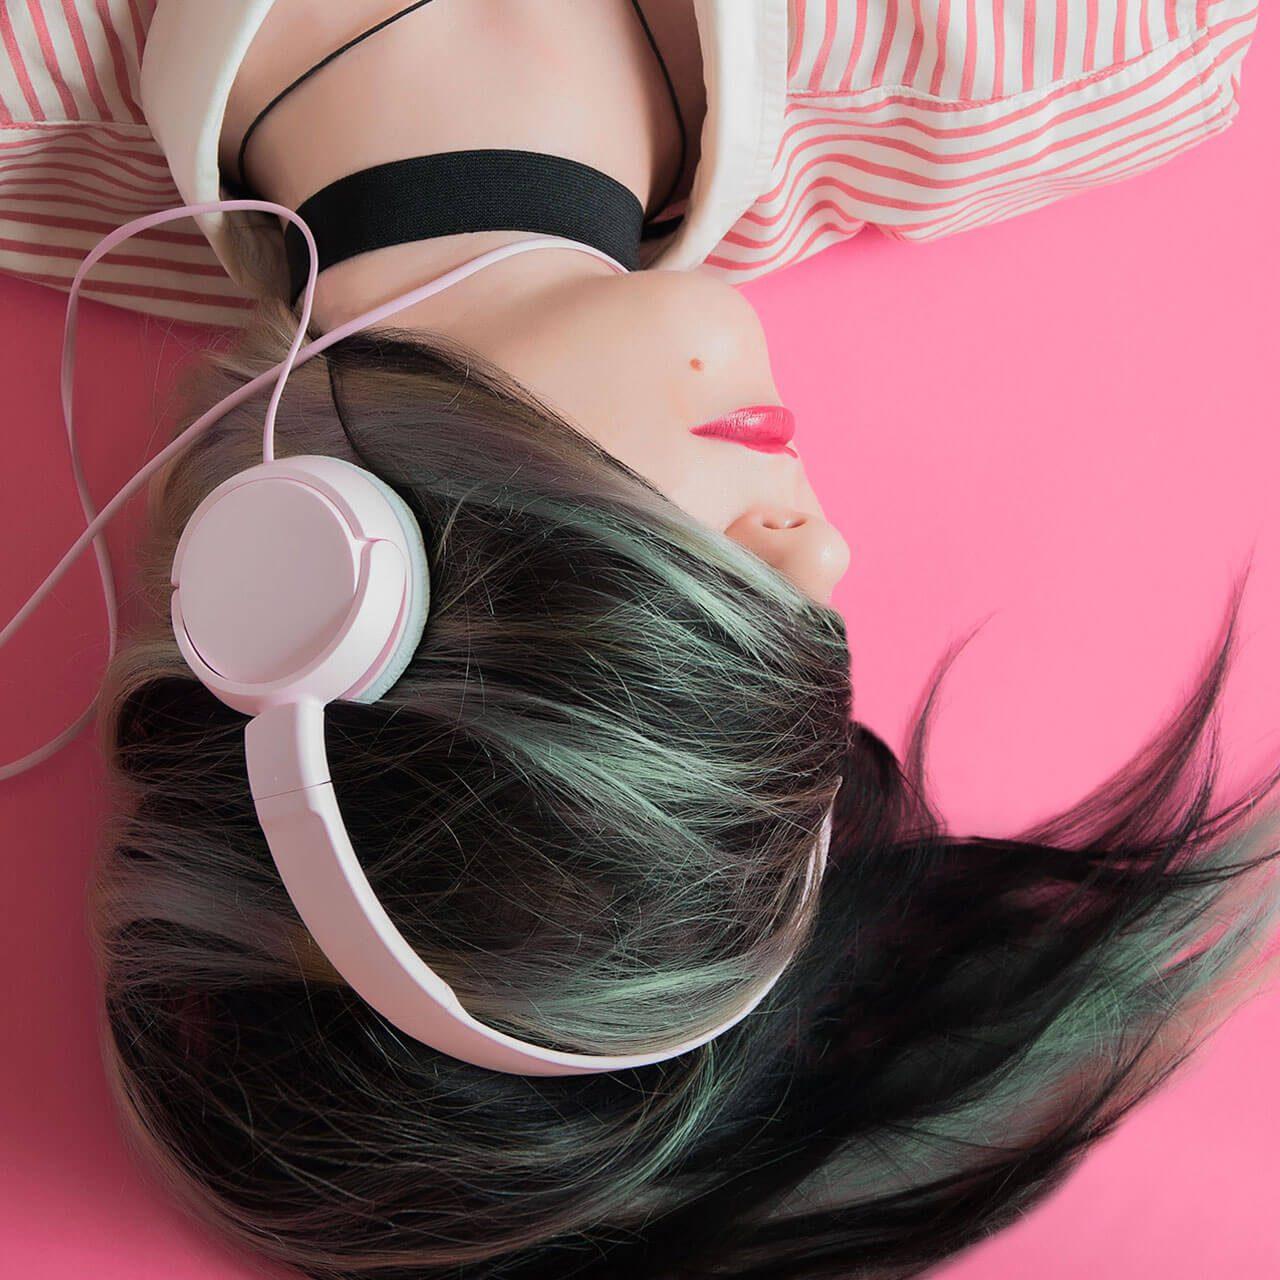 JBL's Everest 700 Elite New, Affordable Wireless Headphones